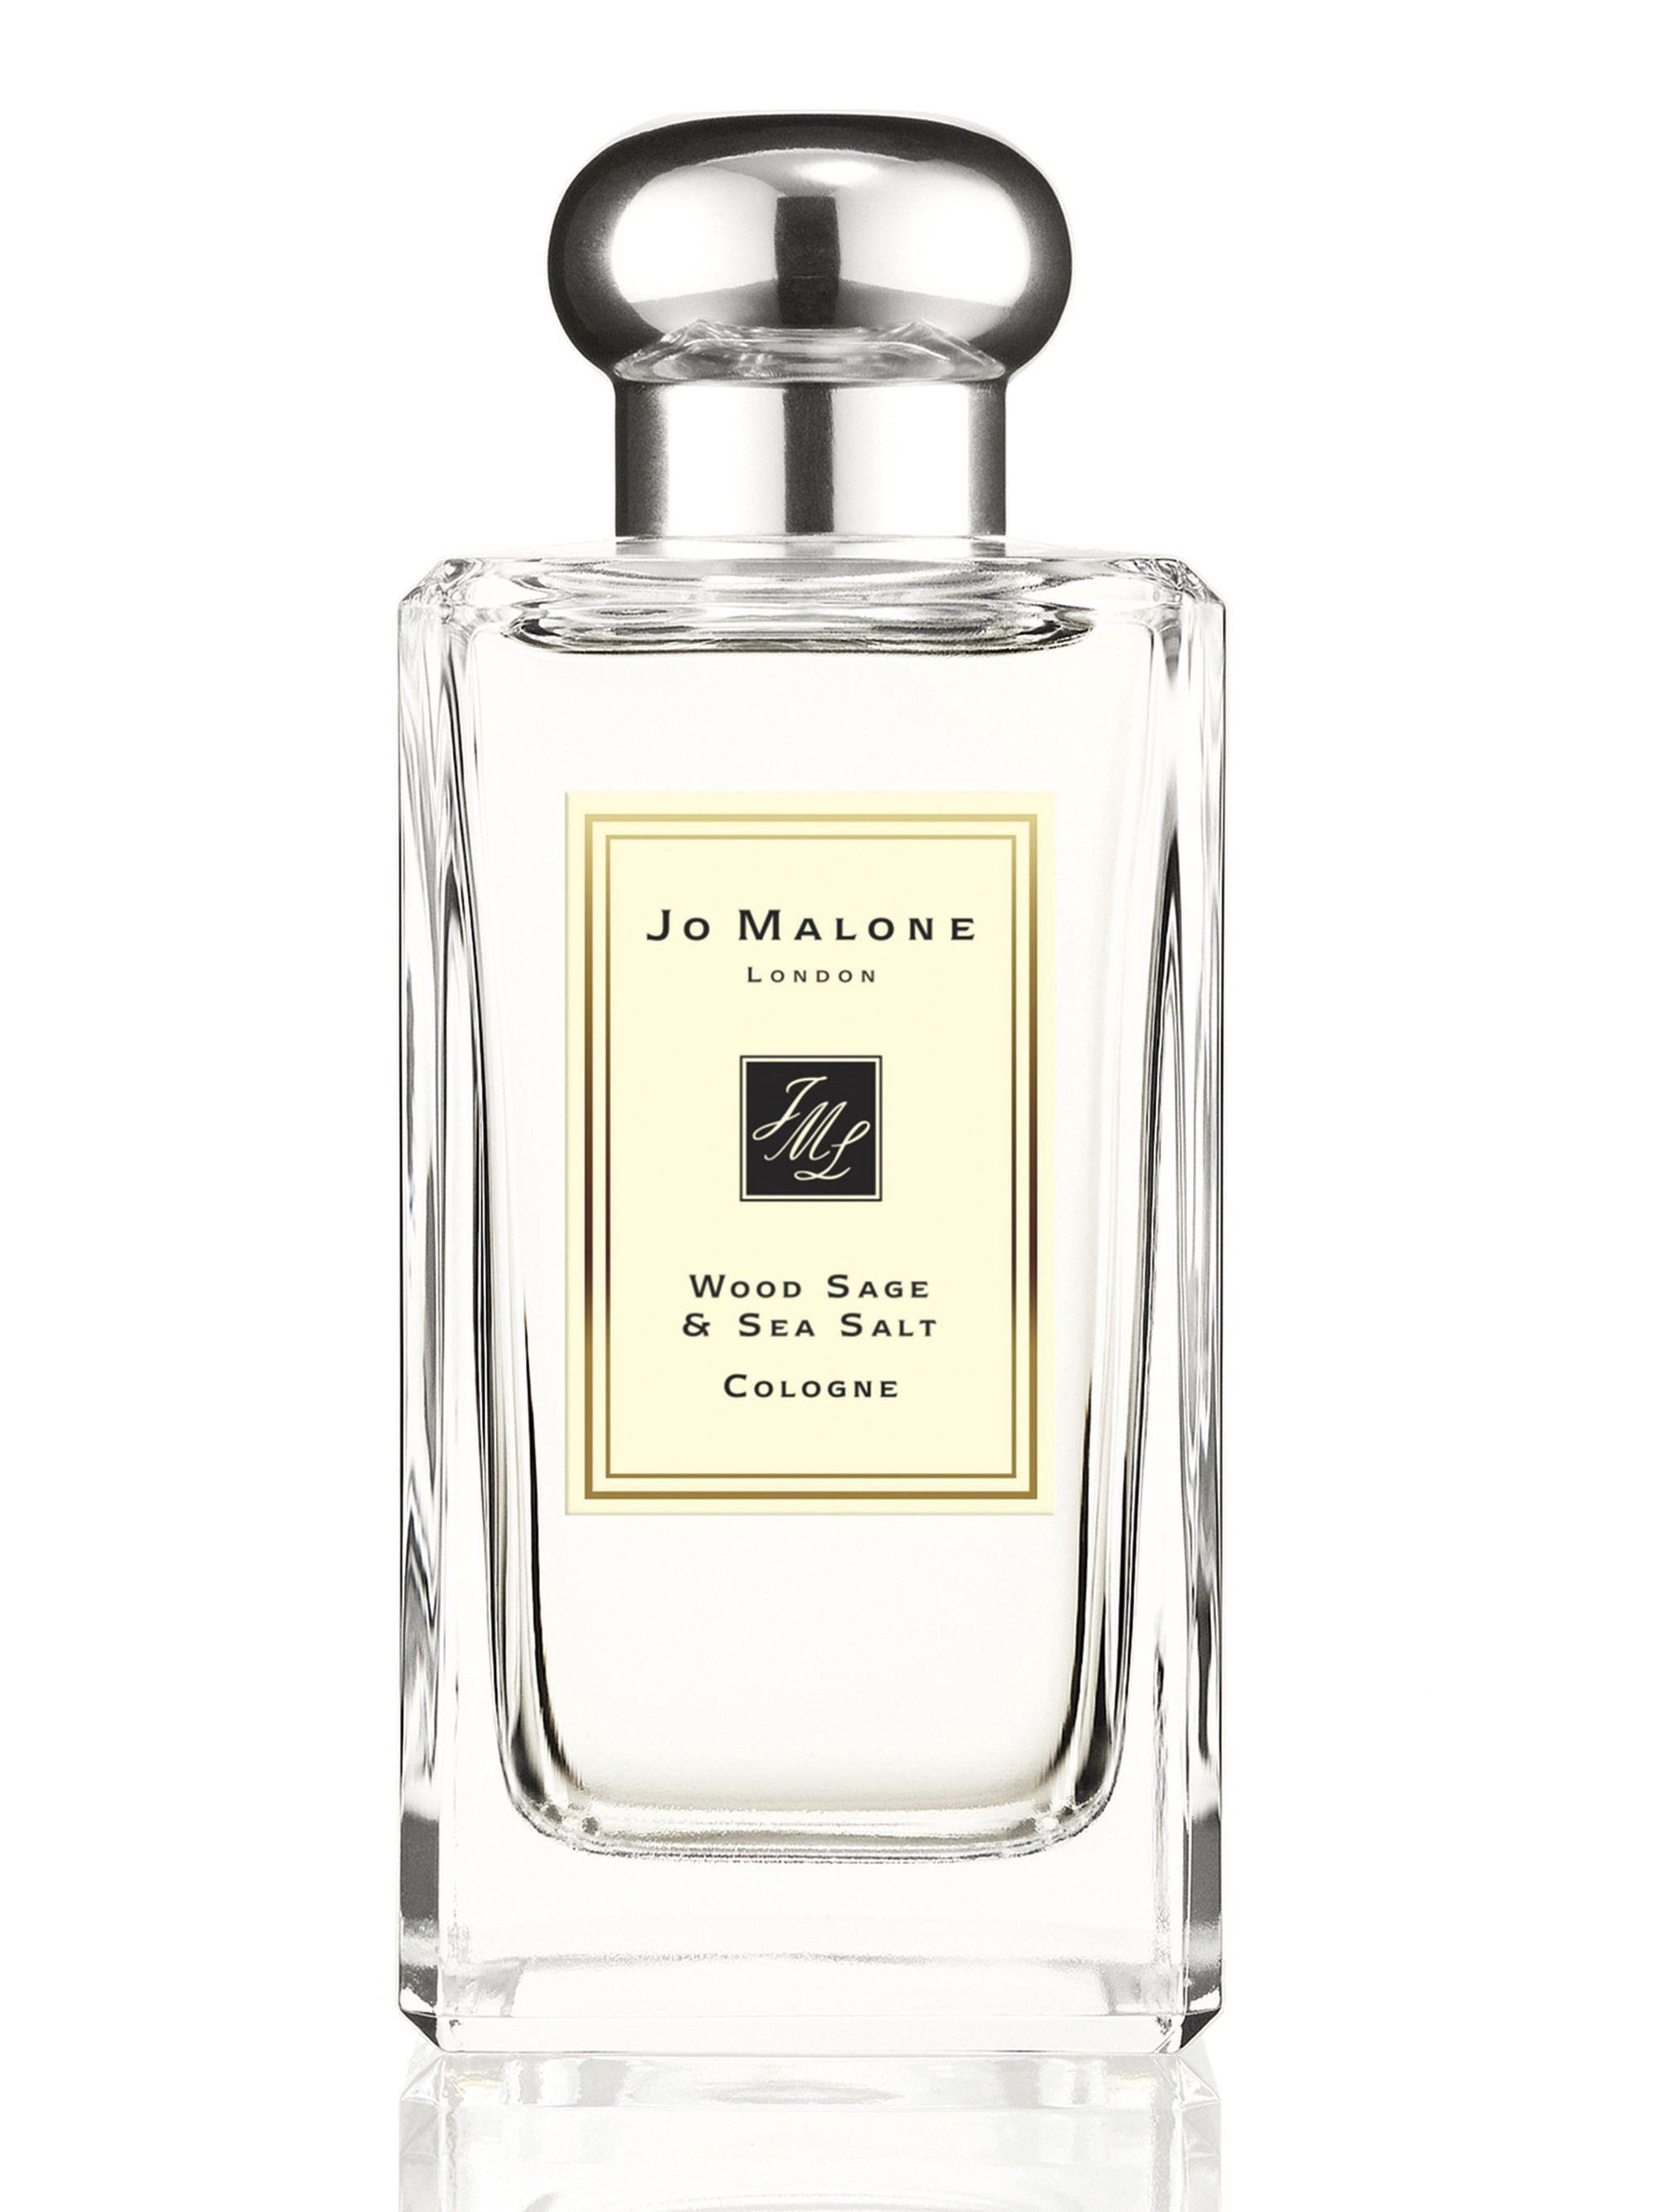 b76e9ff27c8 Jo Malone London Wood Sage   Sea Salt Cologne - 1 Oz. Perfume Fragrance